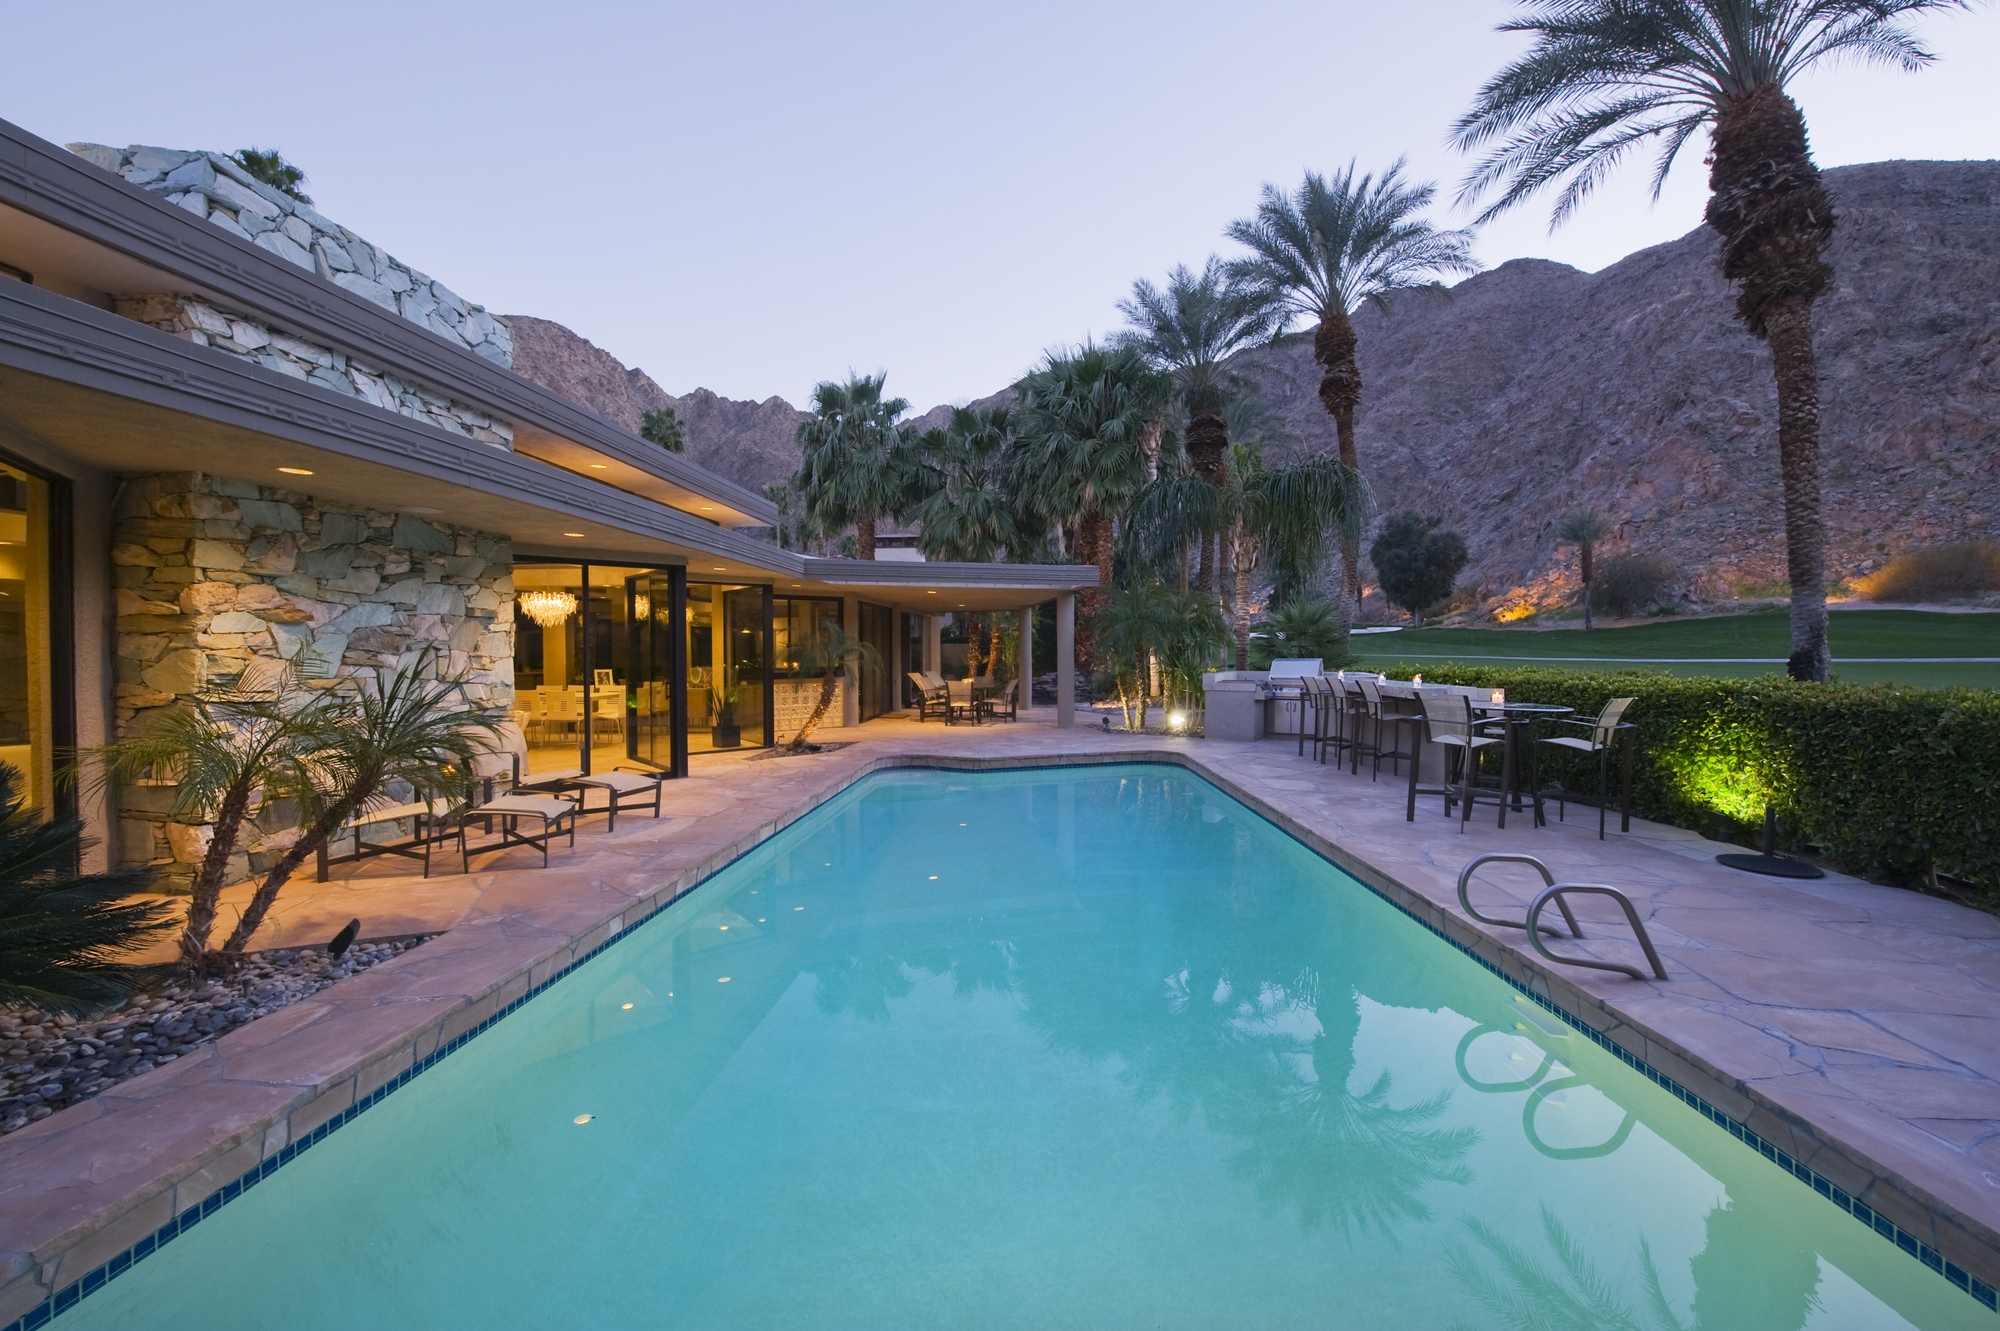 Swimming pool exterior